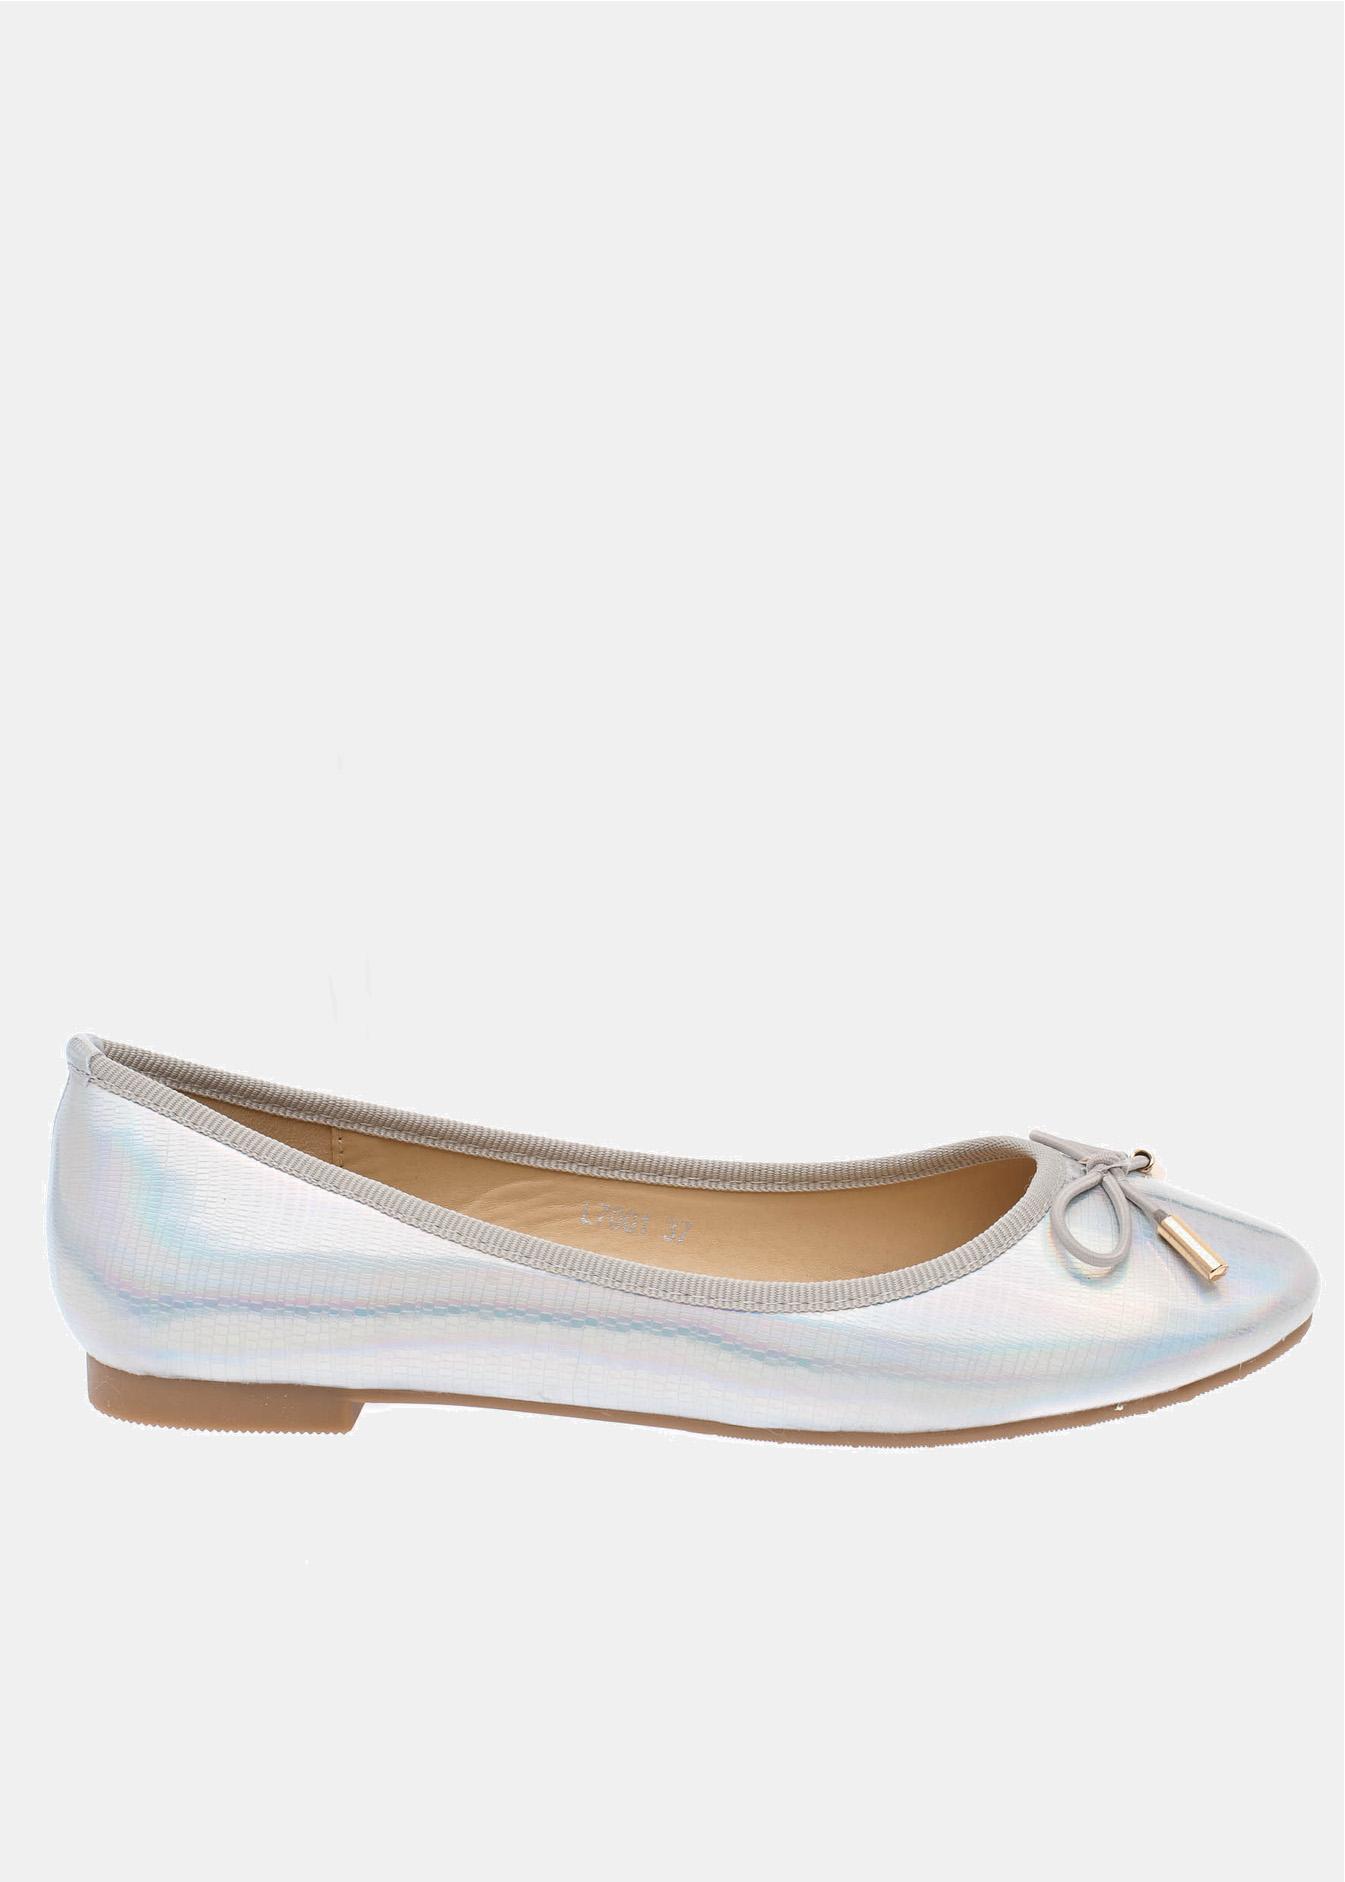 Julia μπαλαρίνα, ασημί loafers